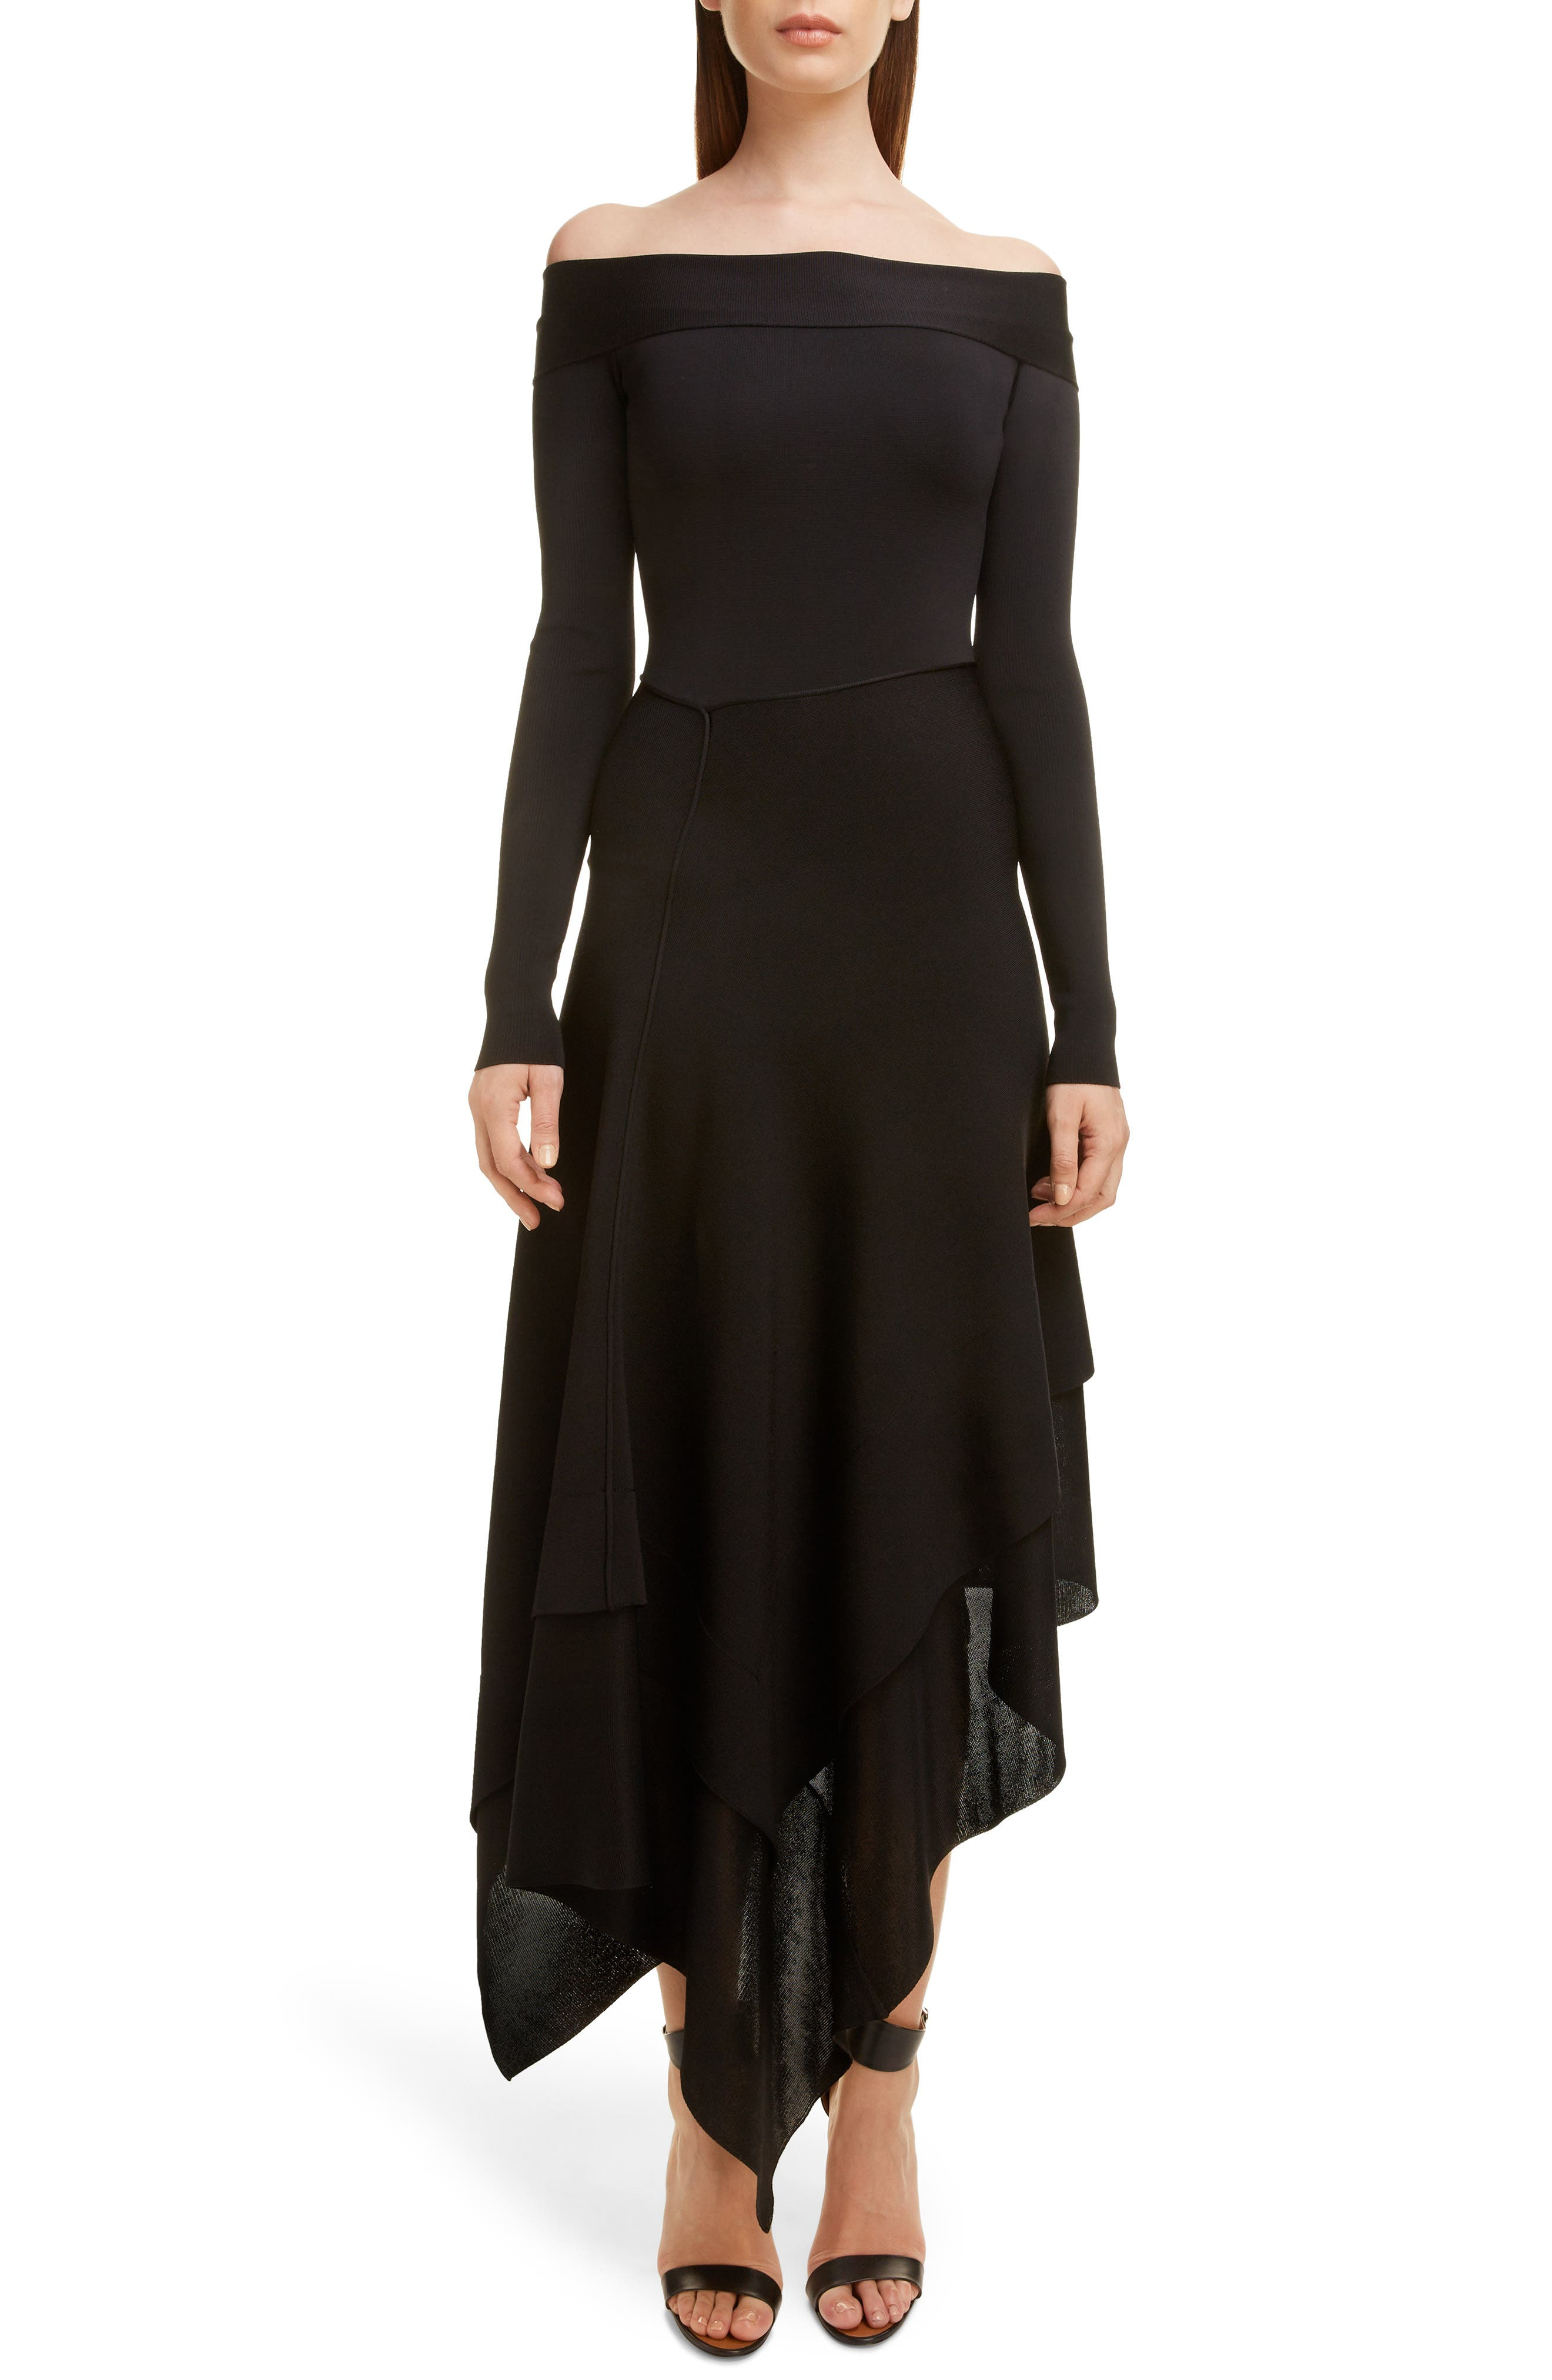 VICTORIA BECKHAM, Long Sleeve Off the Shoulder Asymmetrical Dress, Main thumbnail 1, color, BLACK